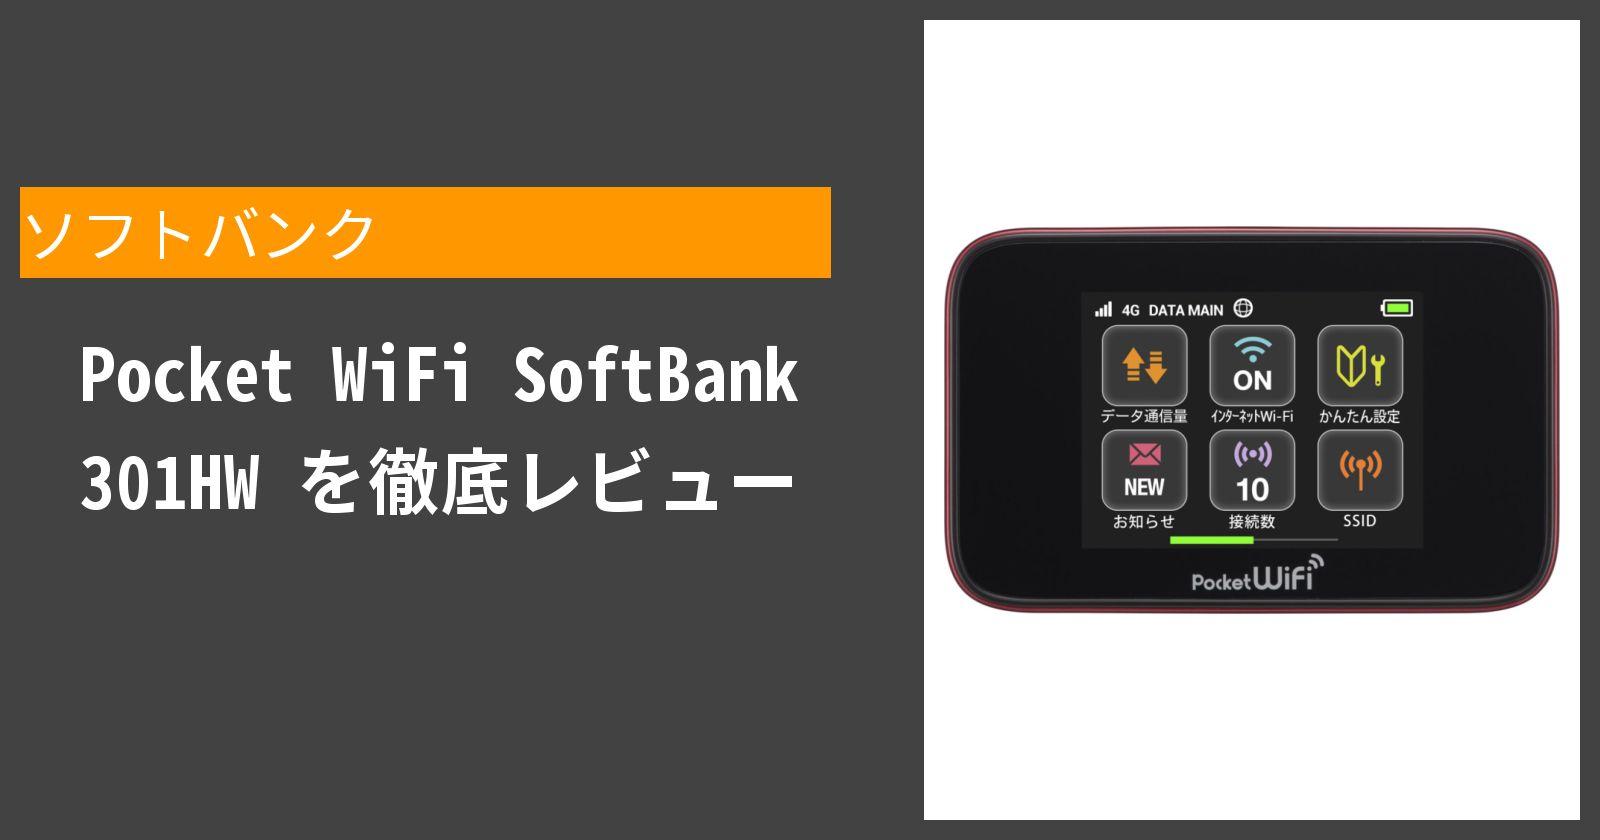 Pocket WiFi SoftBank 301HWを徹底評価